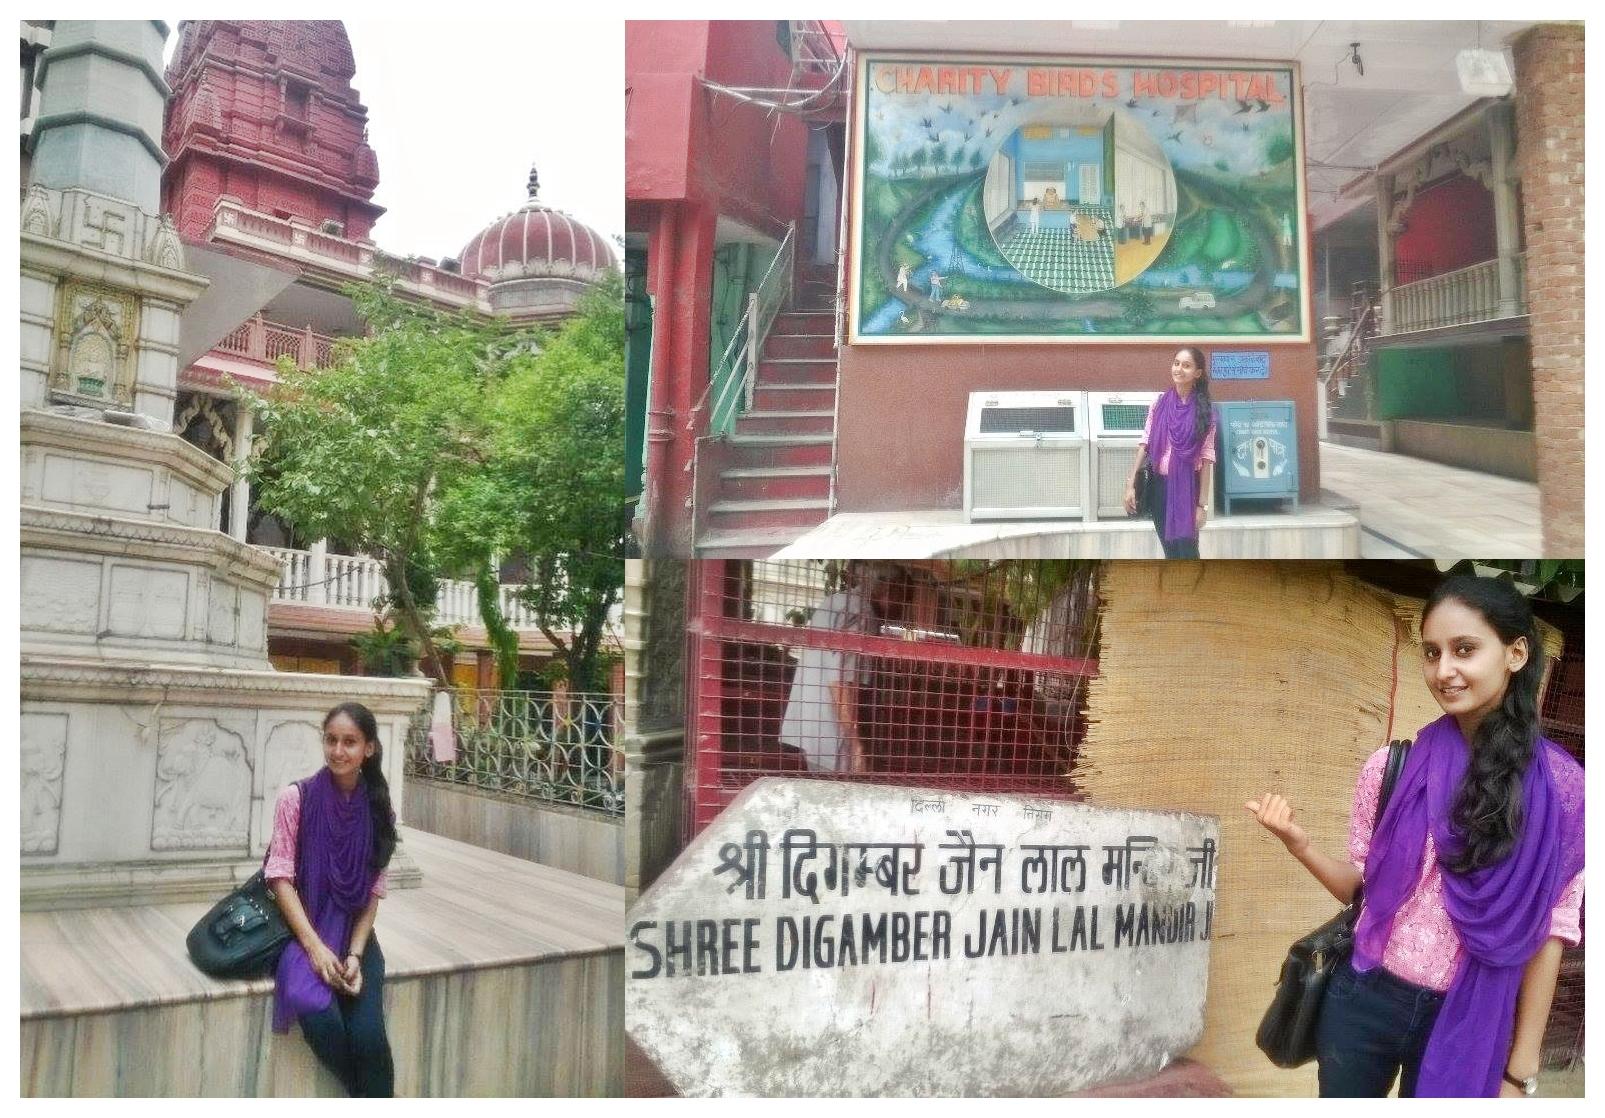 Shri Digamber Jain Lal Mandir, Old Delhi